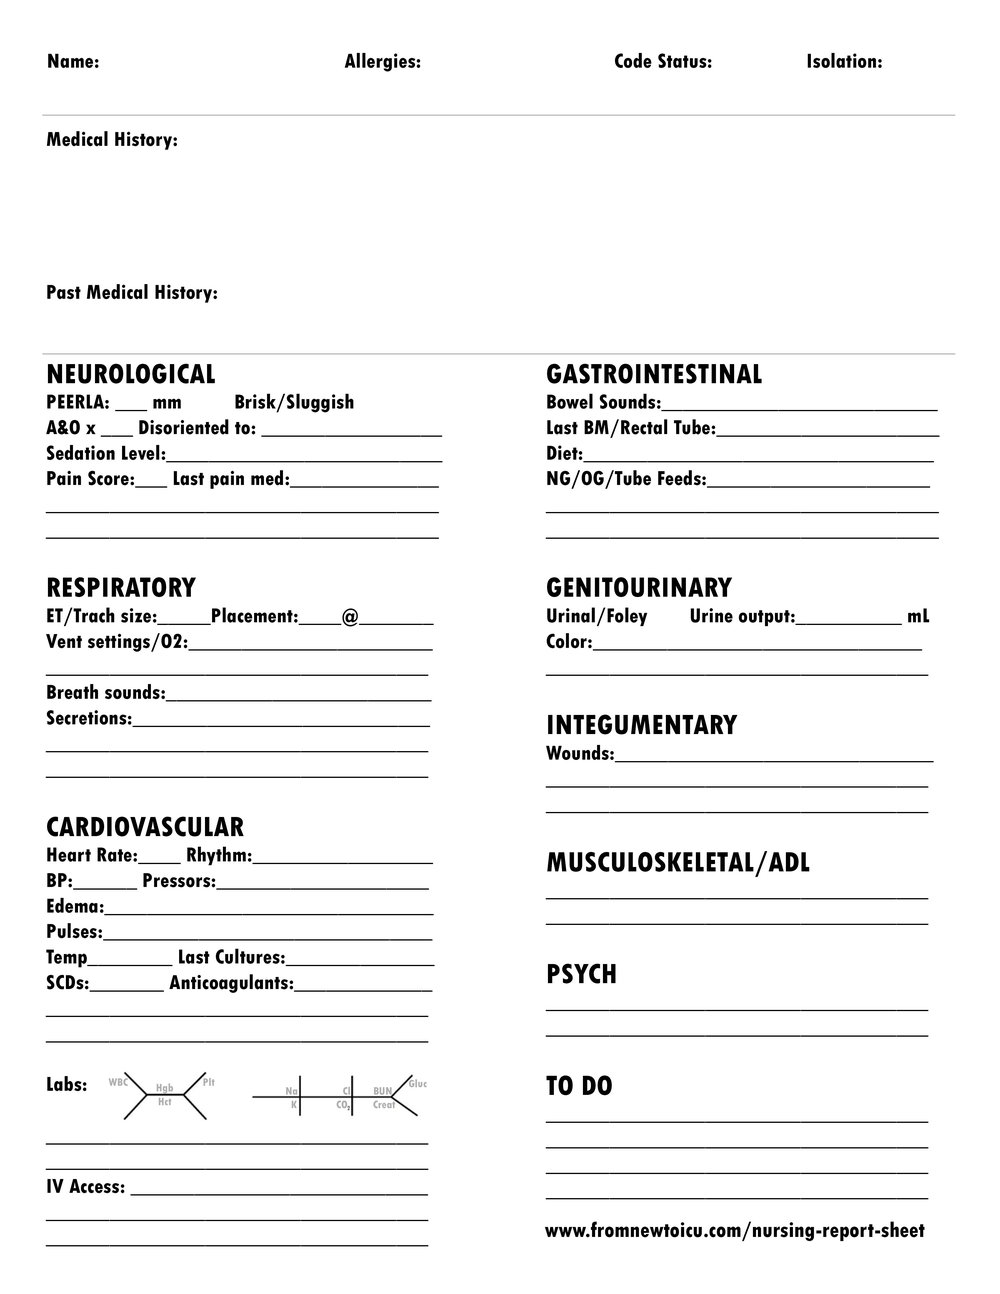 ICU Nursing Report Sheet.jpg